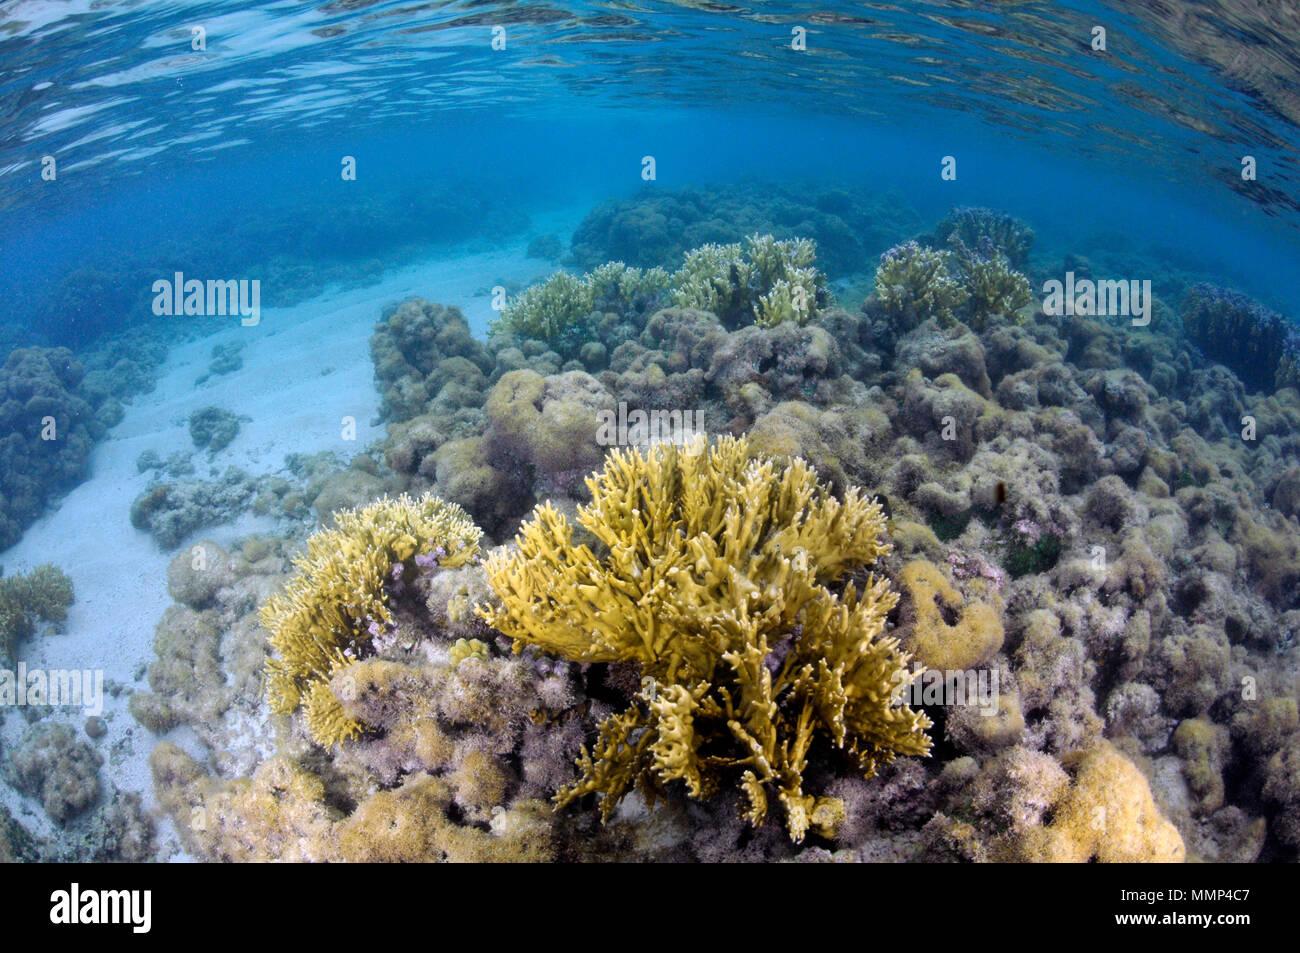 Fire coral, Millepora alcicornis, among dead coral reef at the Maragogi Natural Pools, Maragogi, Alagoas, Brazil - Stock Image